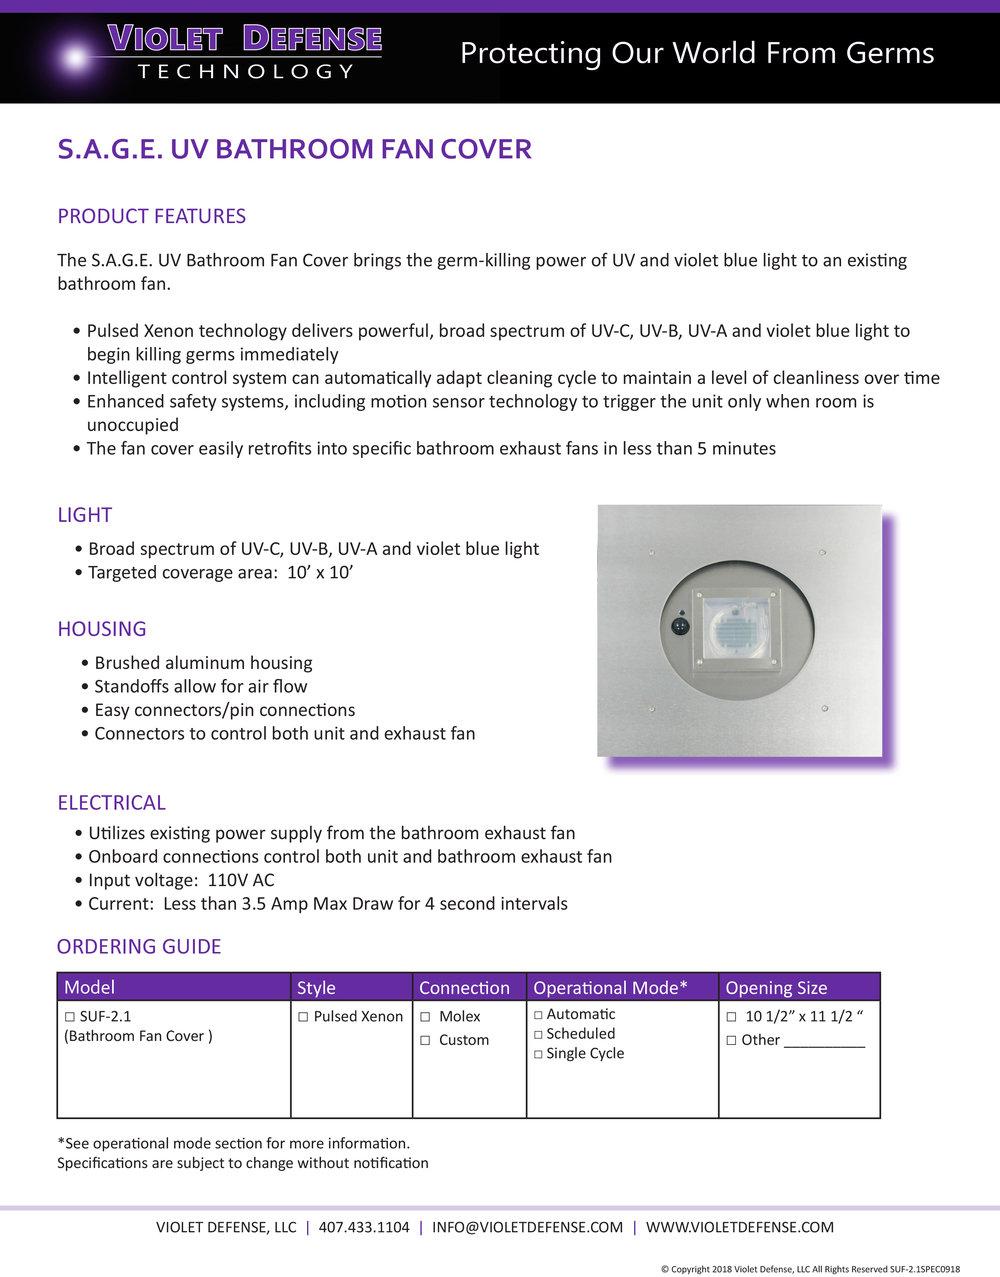 Violet Defense - SAGE UV Bath Fan Specs Gen 2-1.jpg